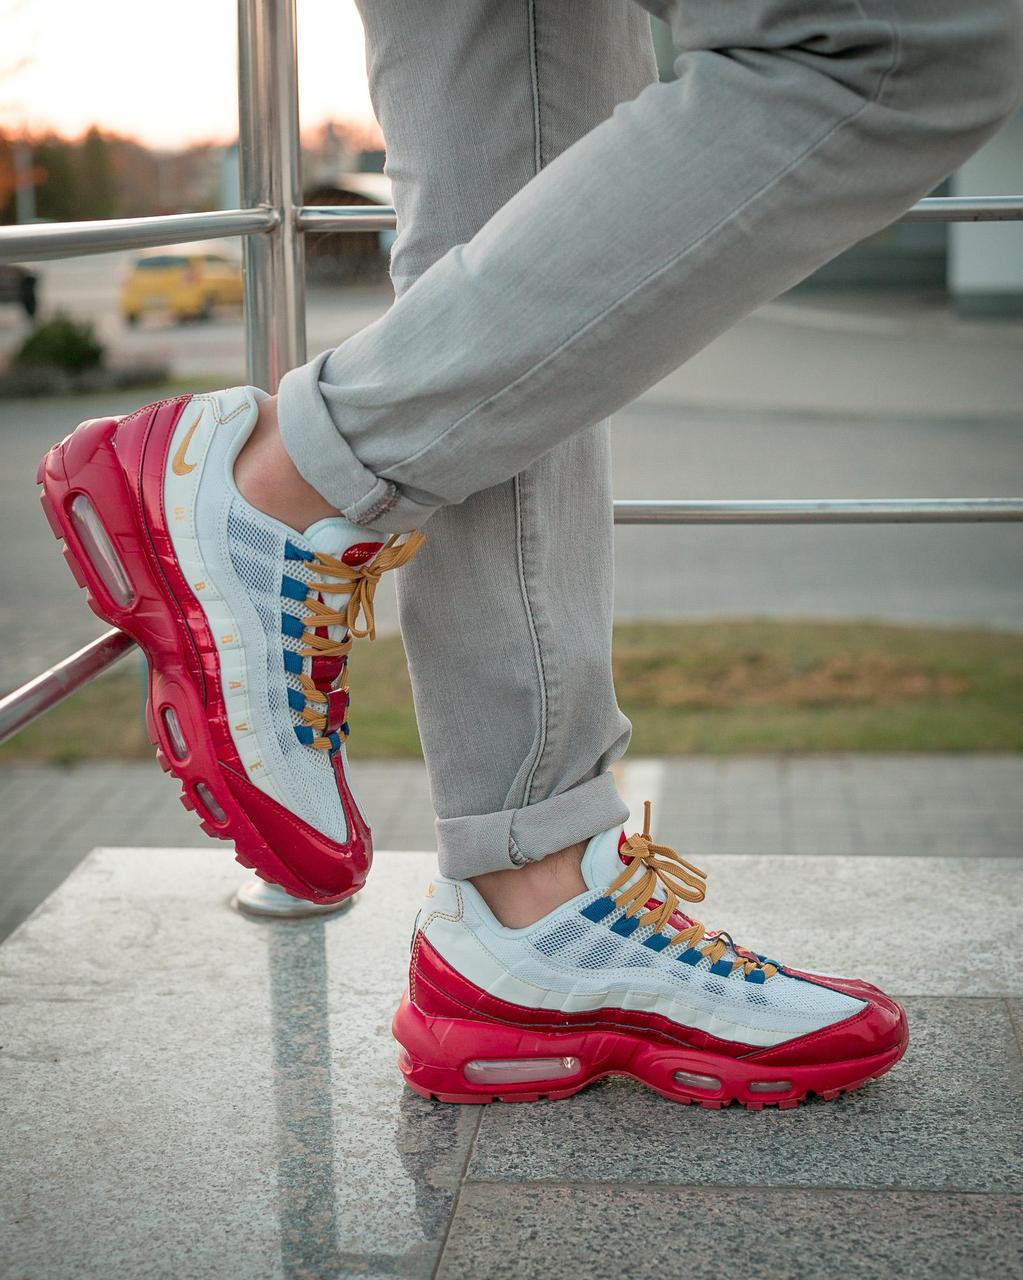 Кроссовки женские в стиле Nike Air Max 95